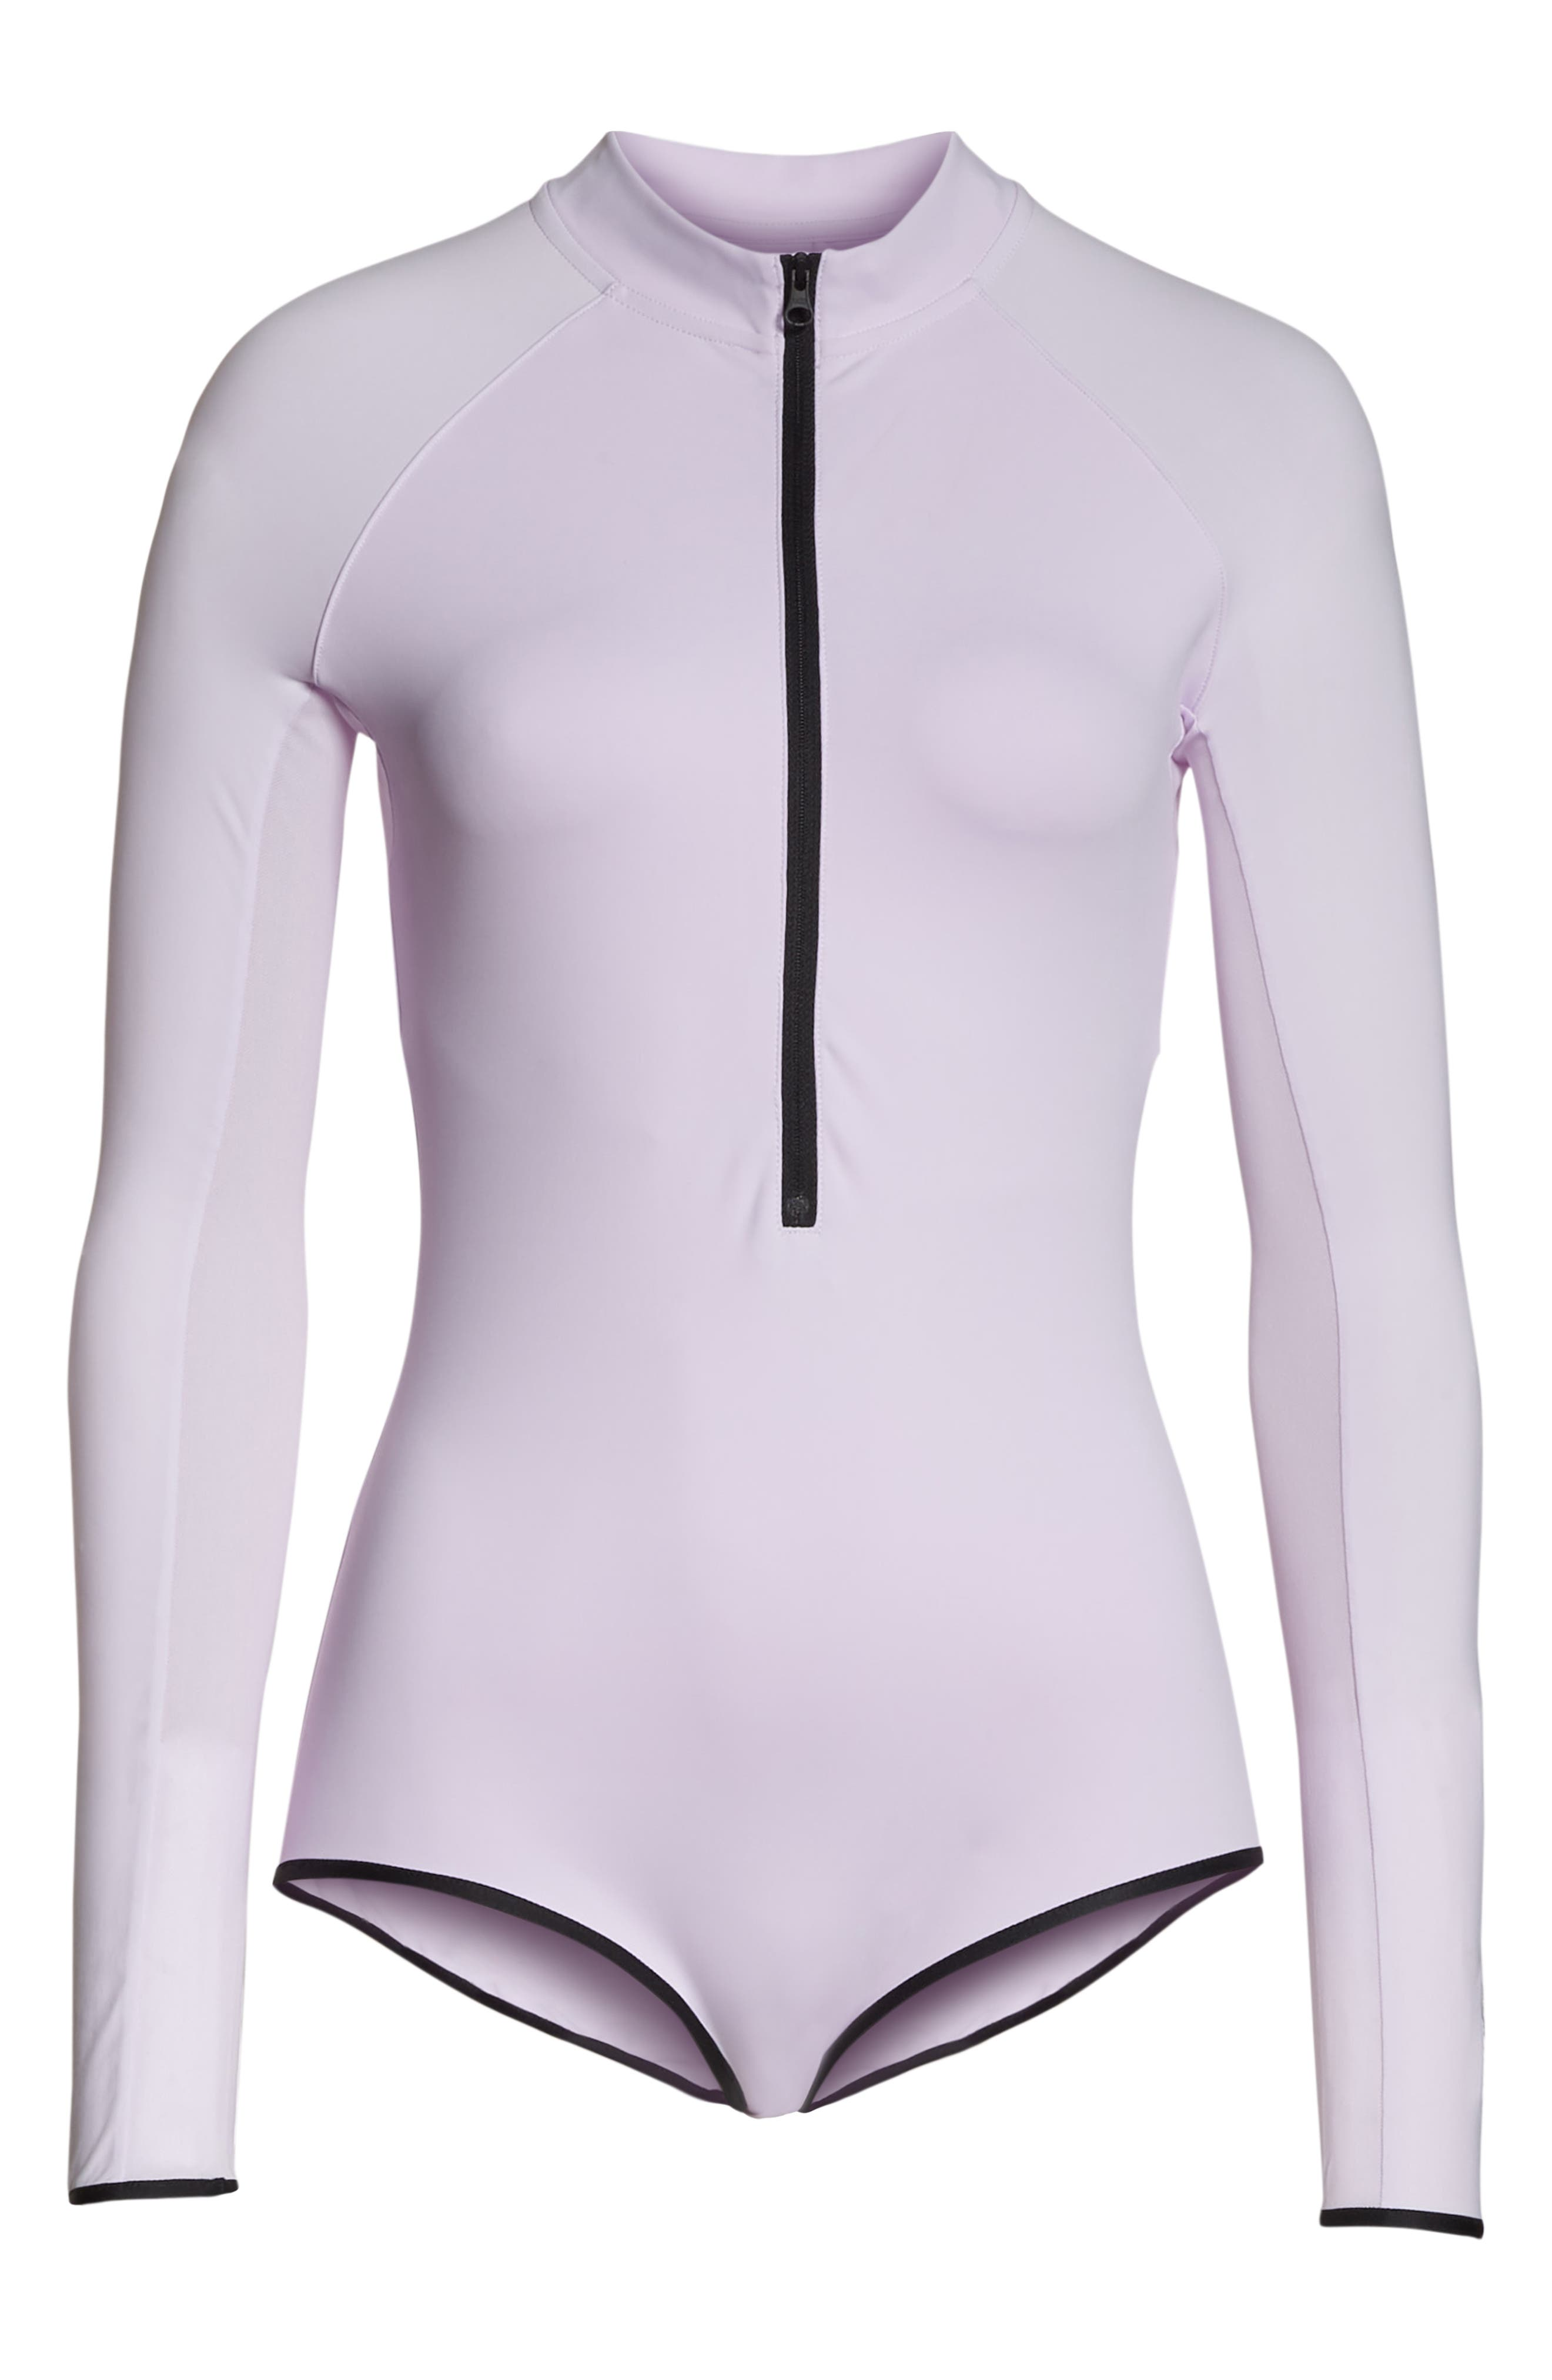 NRG Women's Dri-FIT Long Sleeve Bodysuit,                             Alternate thumbnail 7, color,                             509